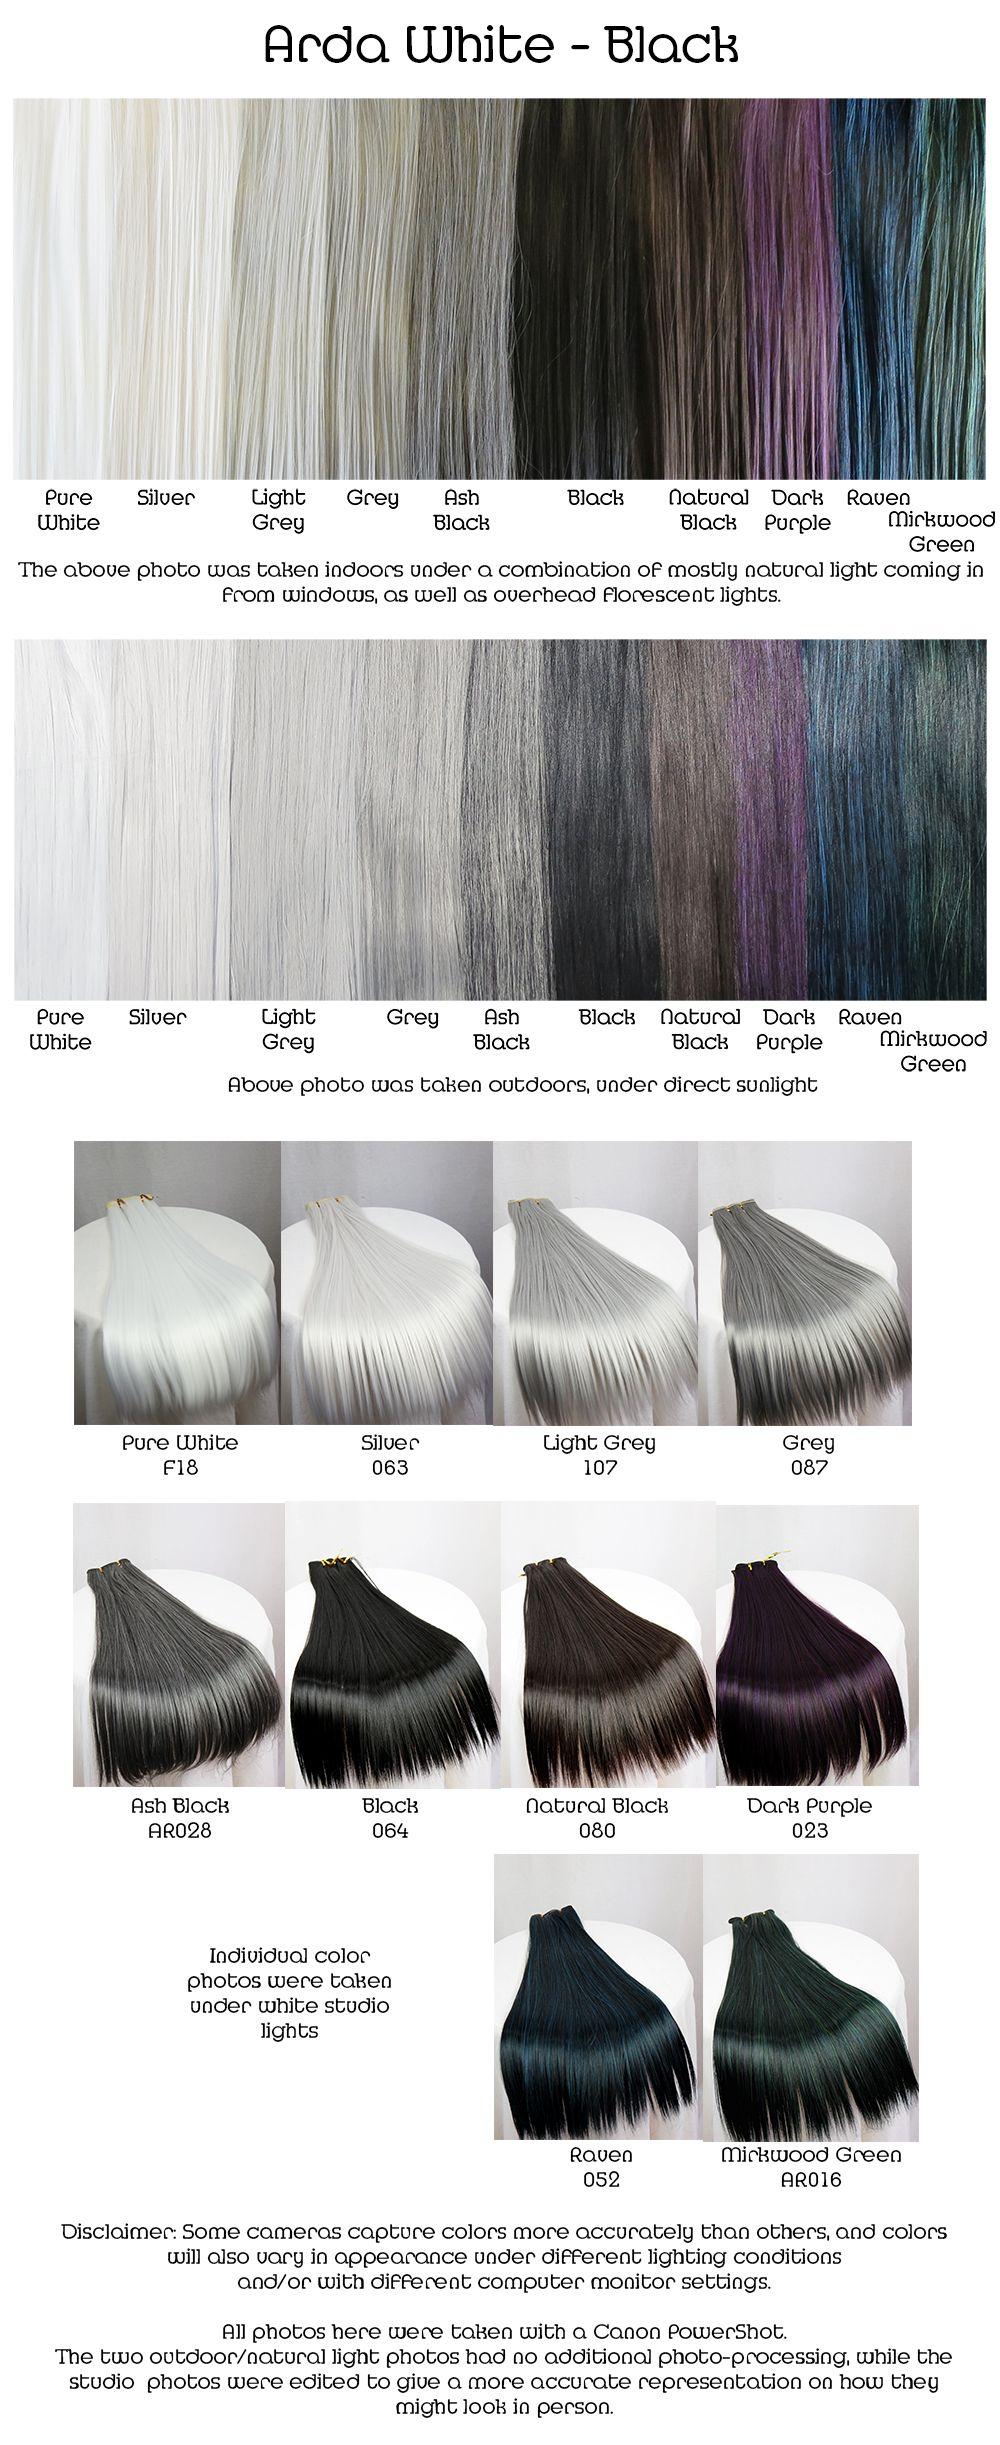 Color chart for wigs - Arda White Black Wig Fiber Color Pallette